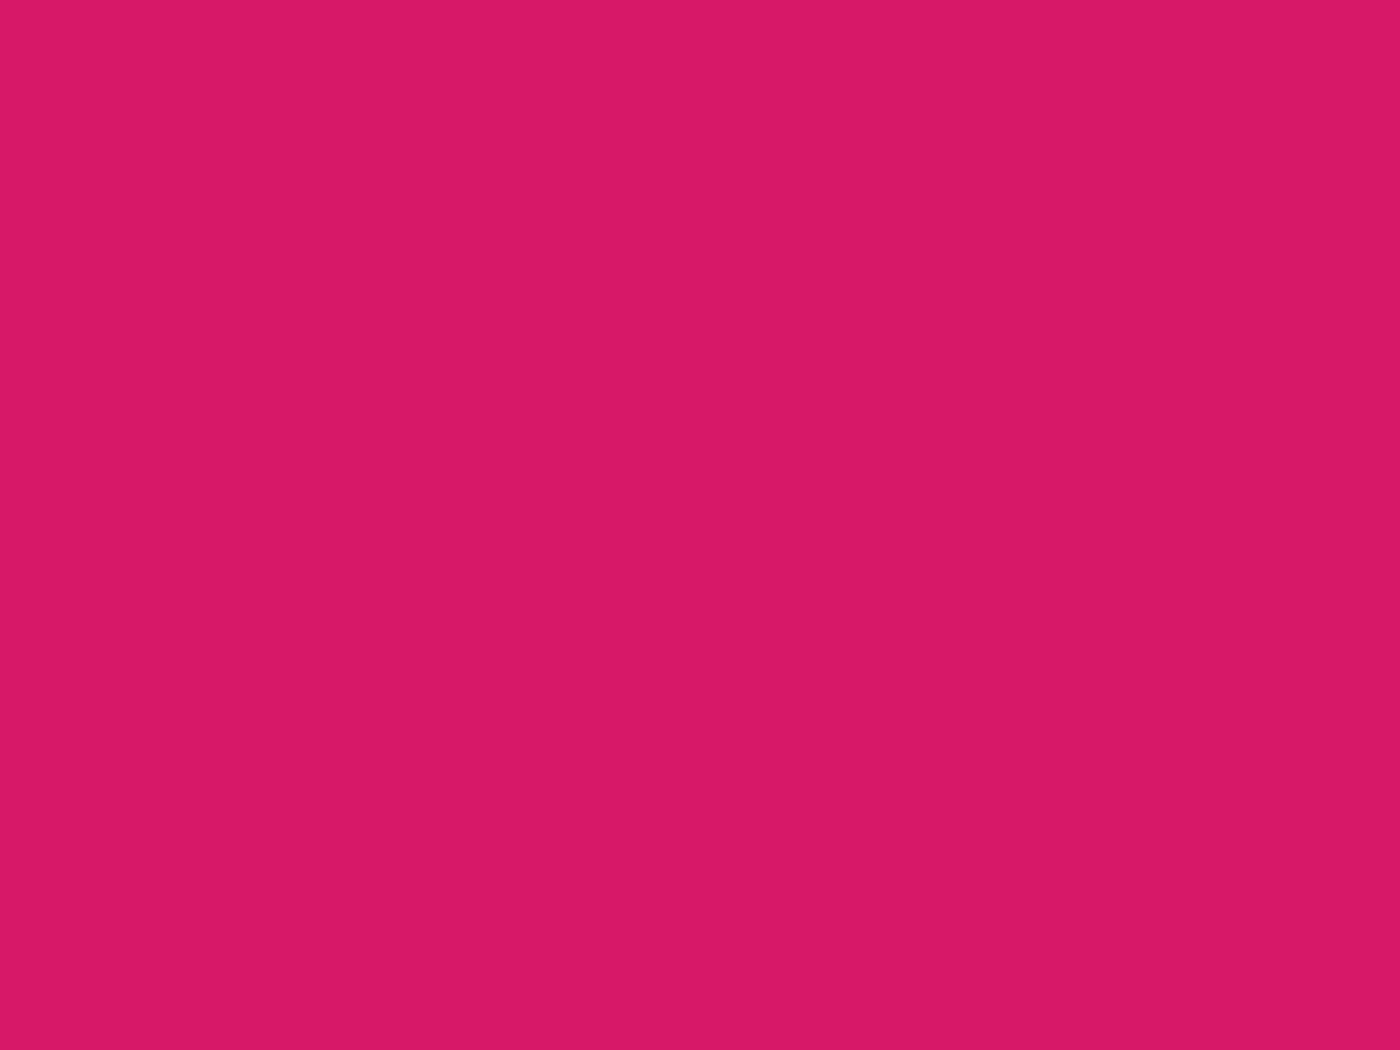 1400x1050 Dogwood Rose Solid Color Background